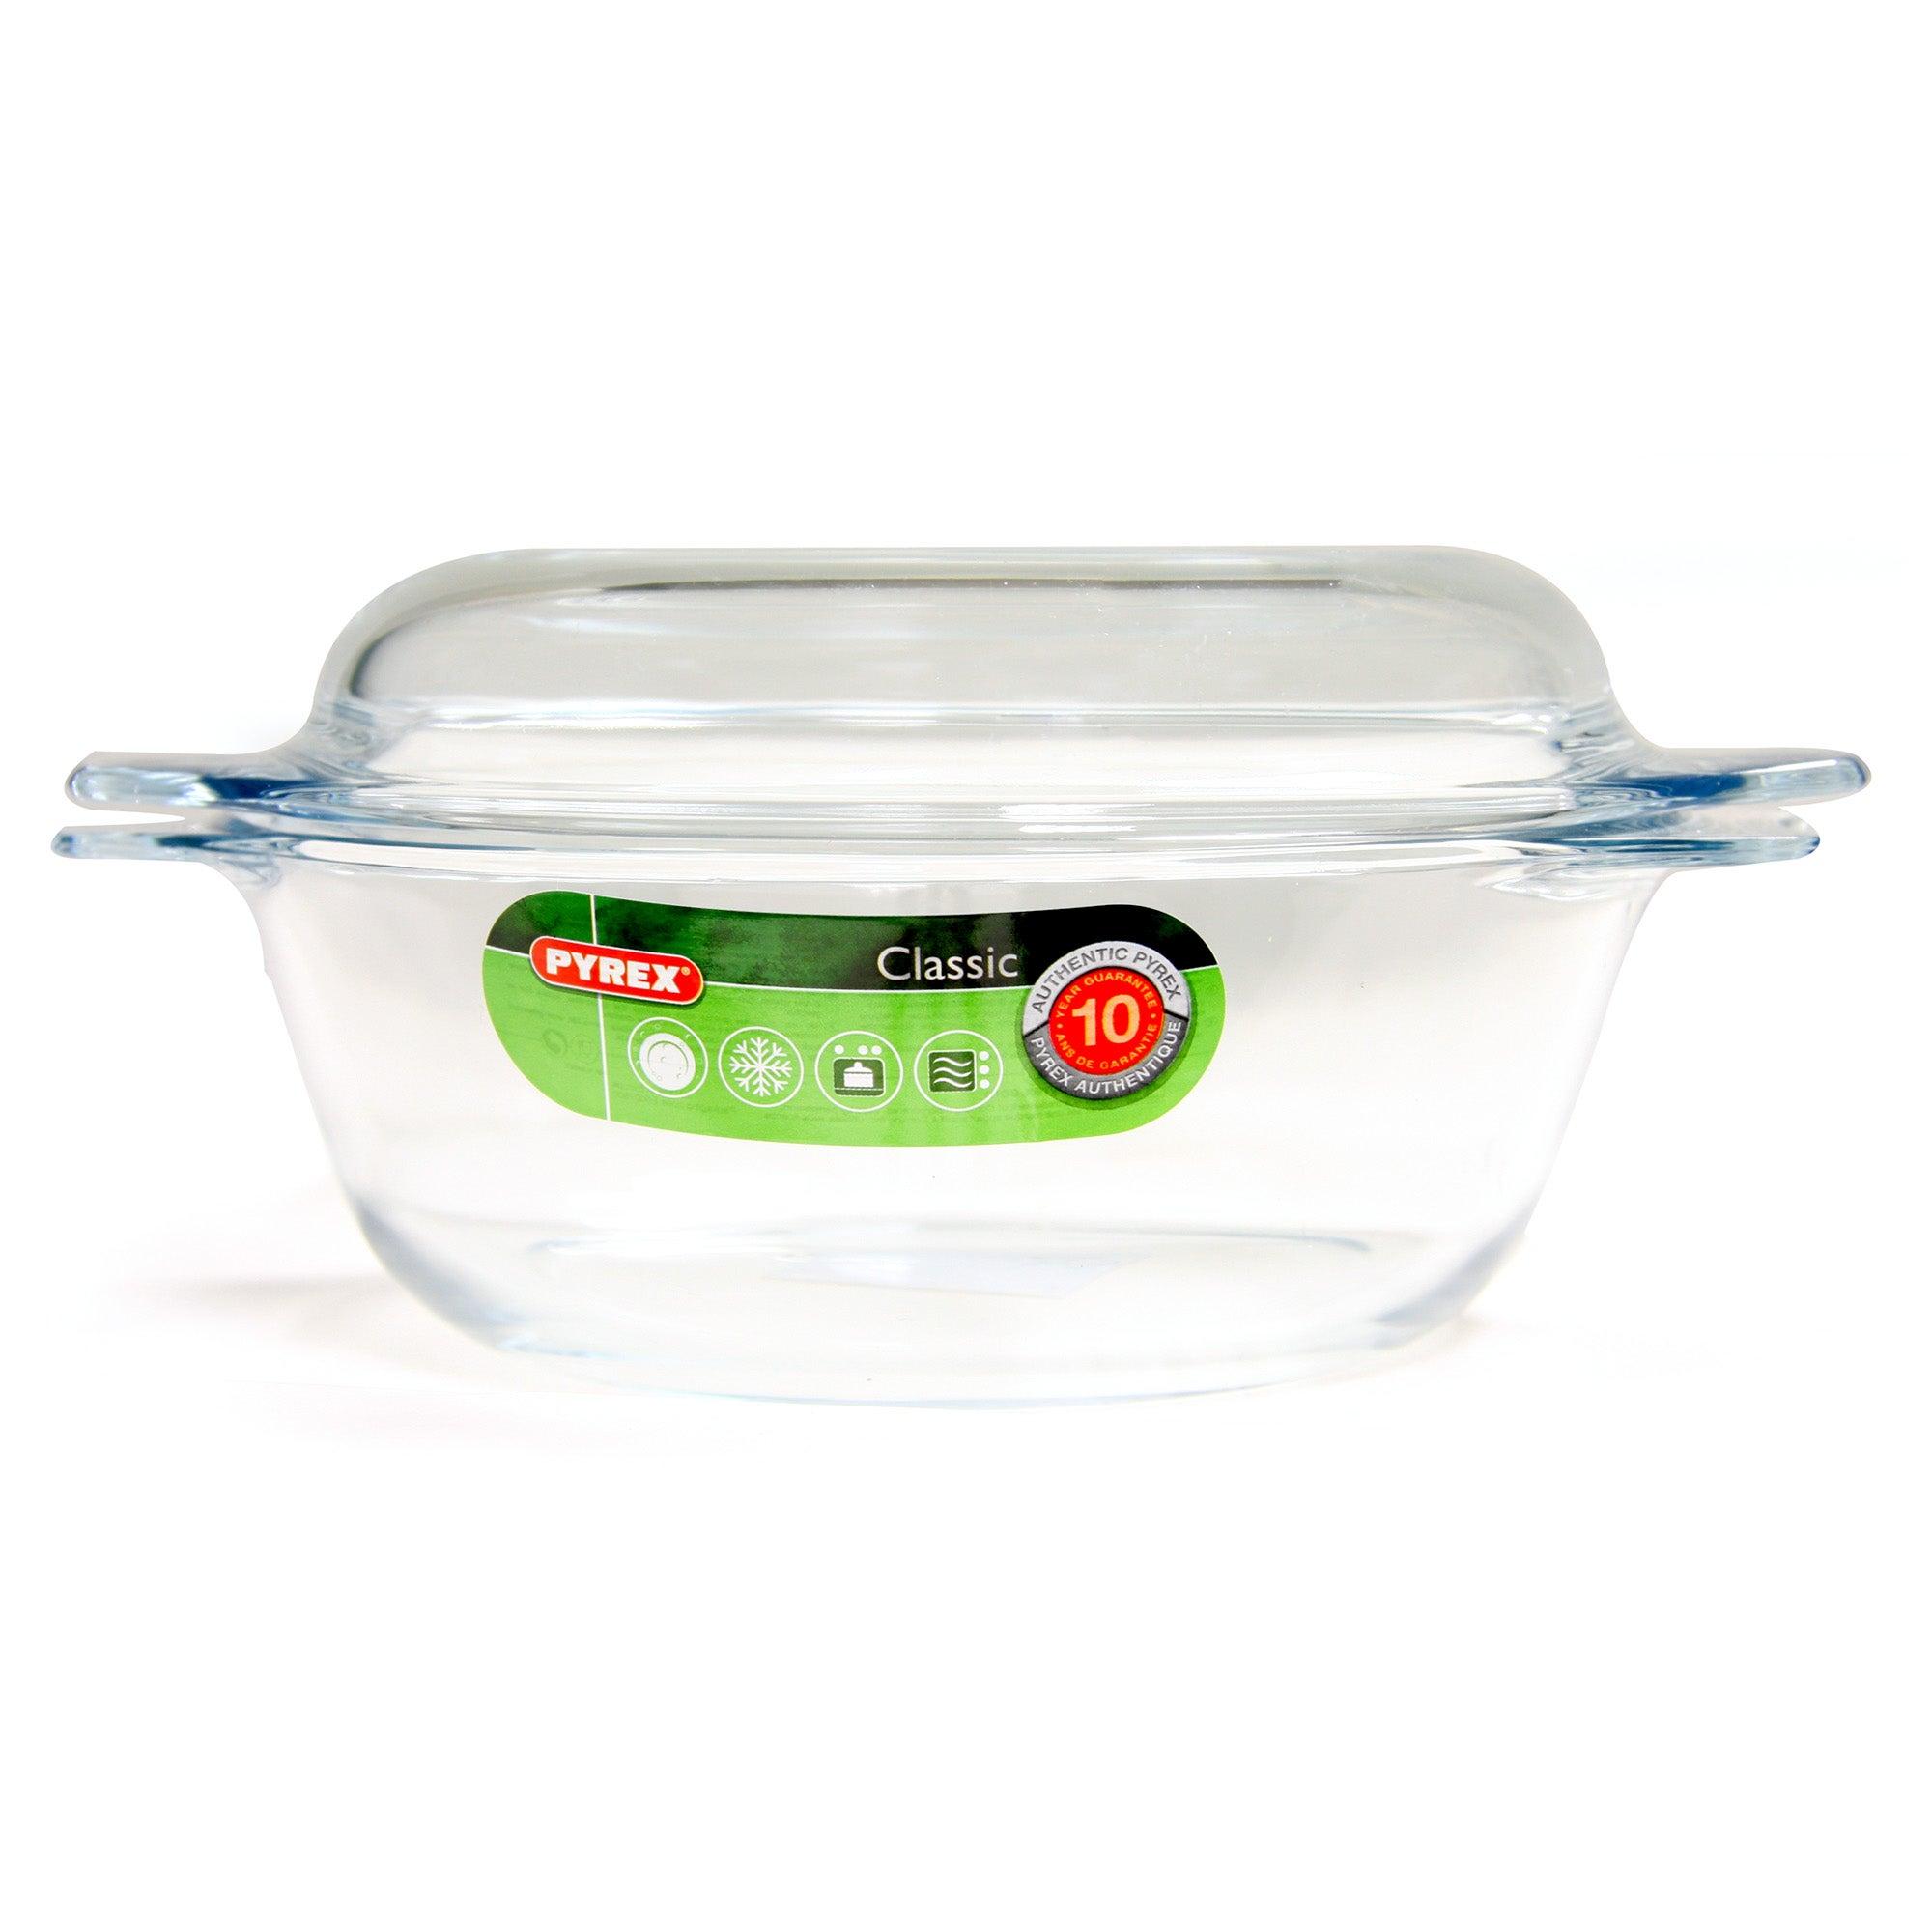 Pyrex 2 Litre Round Casserole Dish